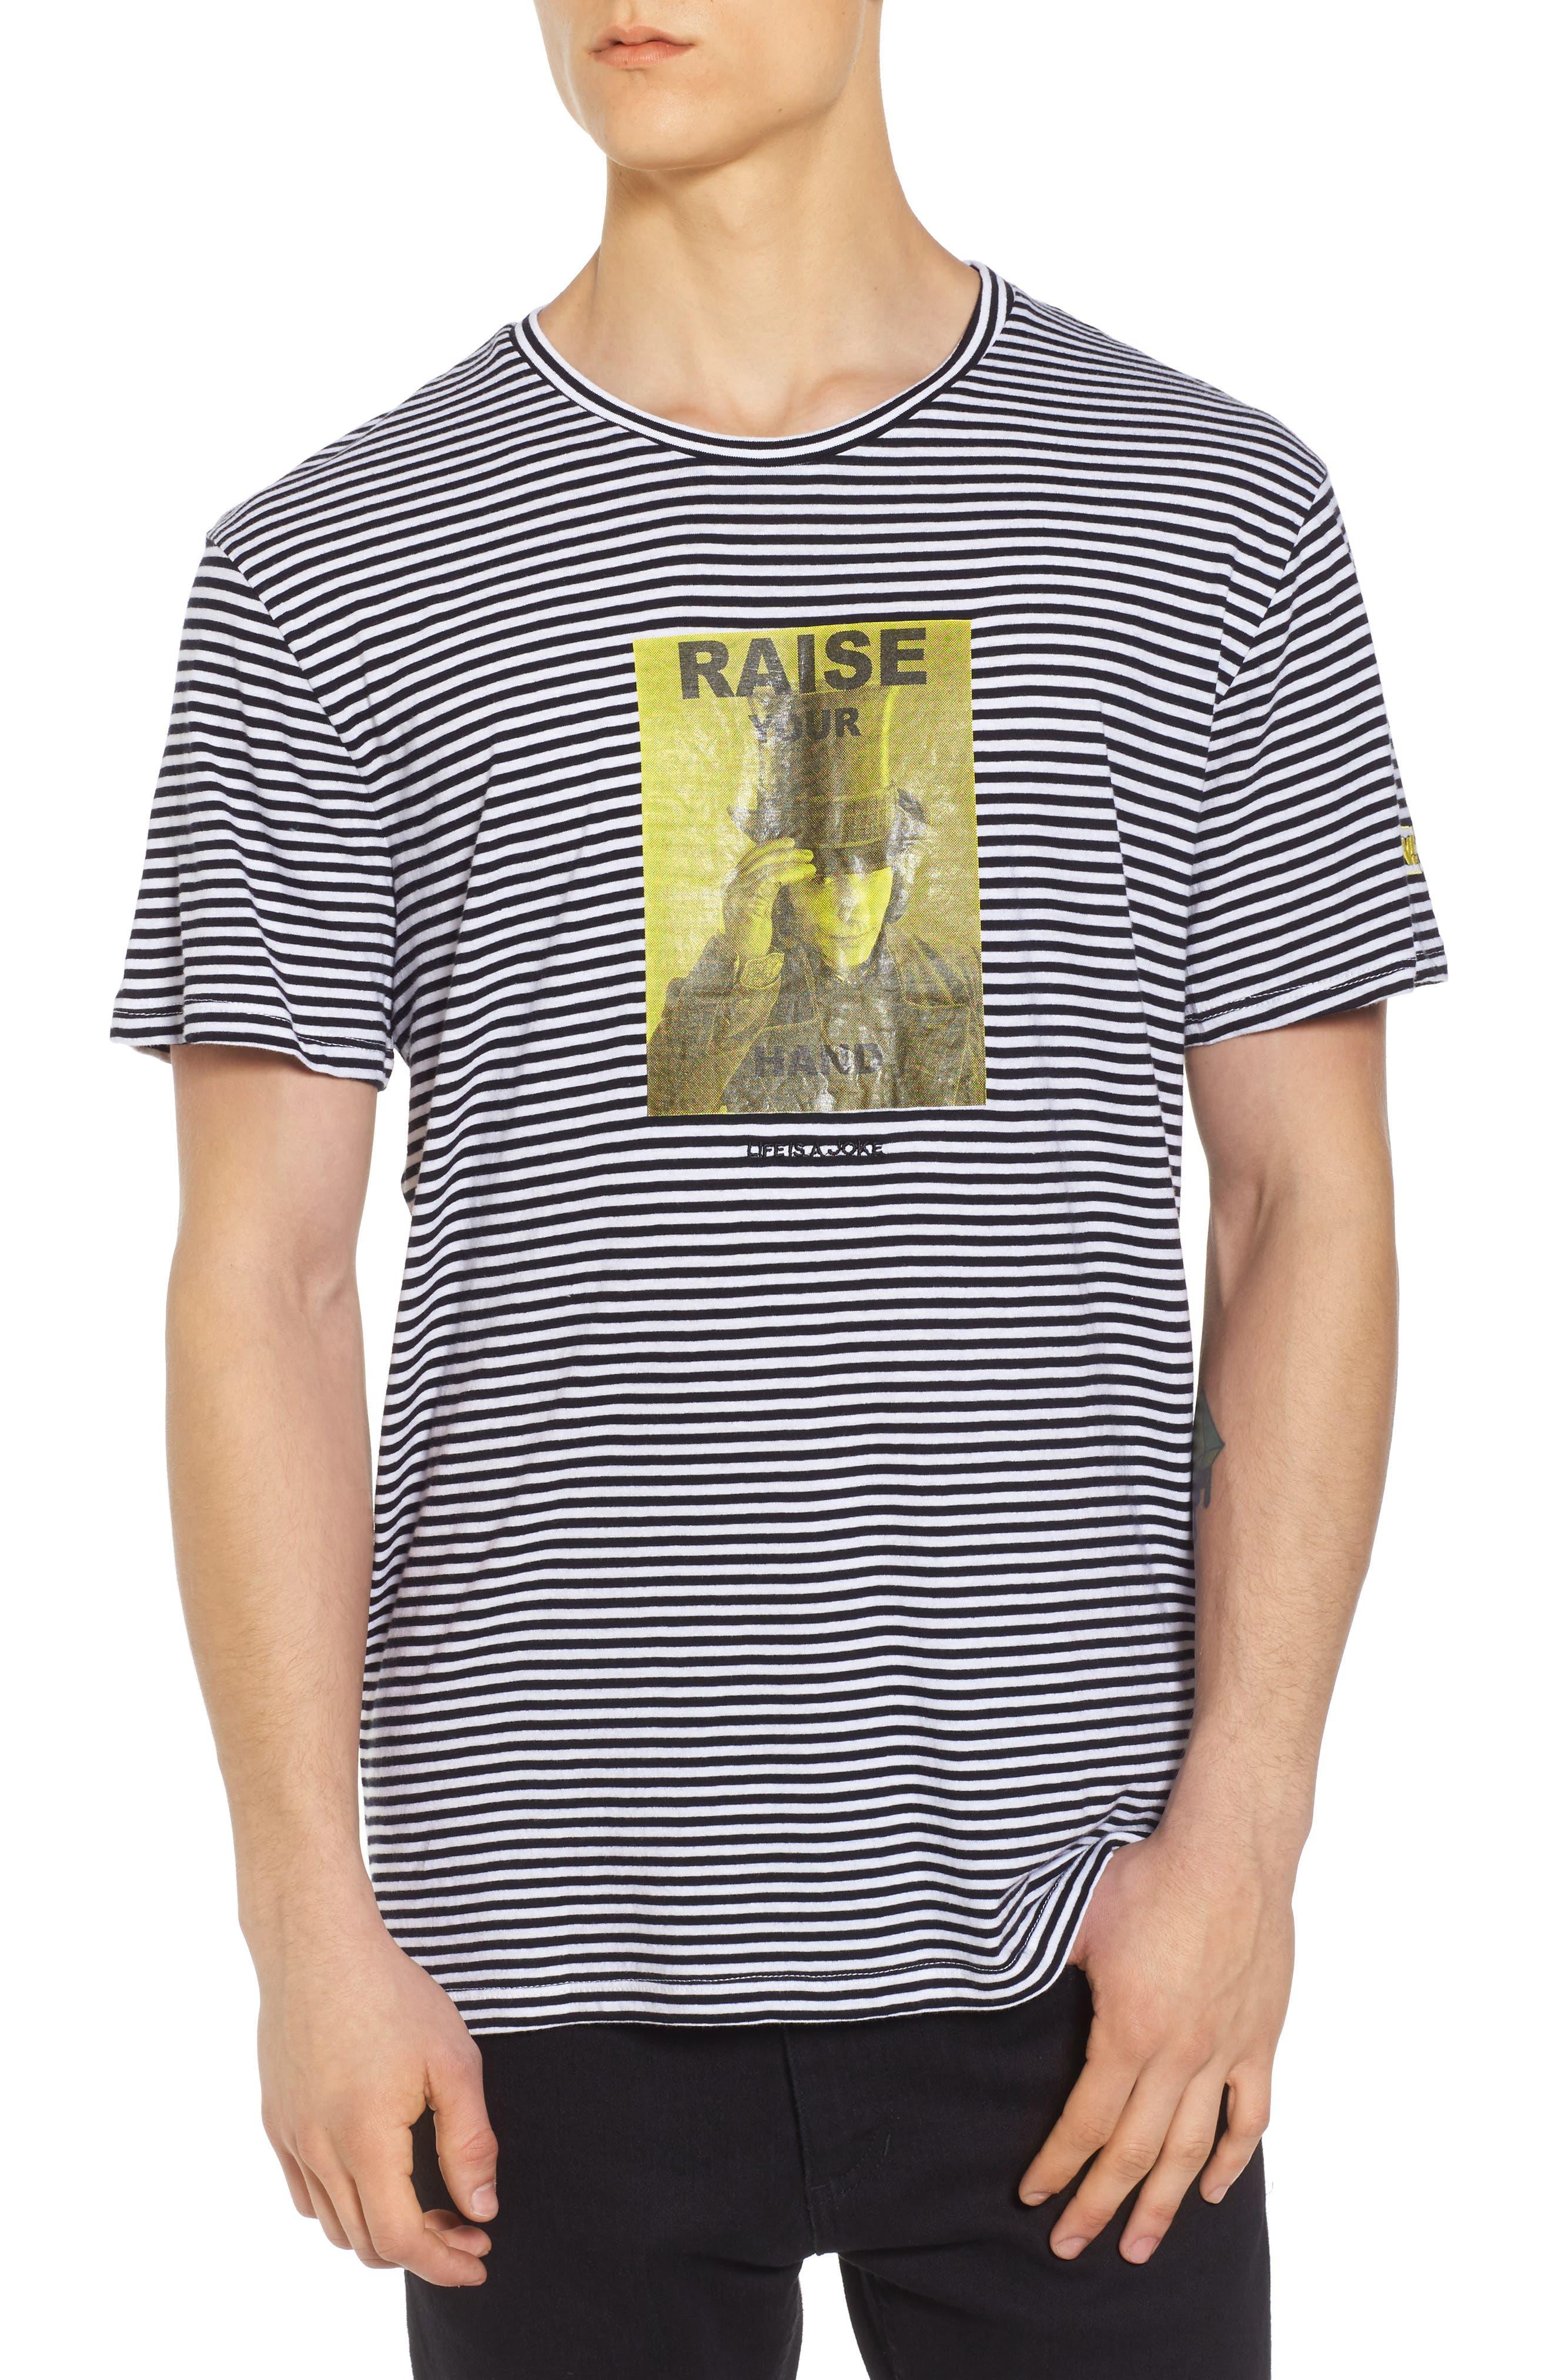 Main Image - ELEVENPARIS Favli T-Shirt